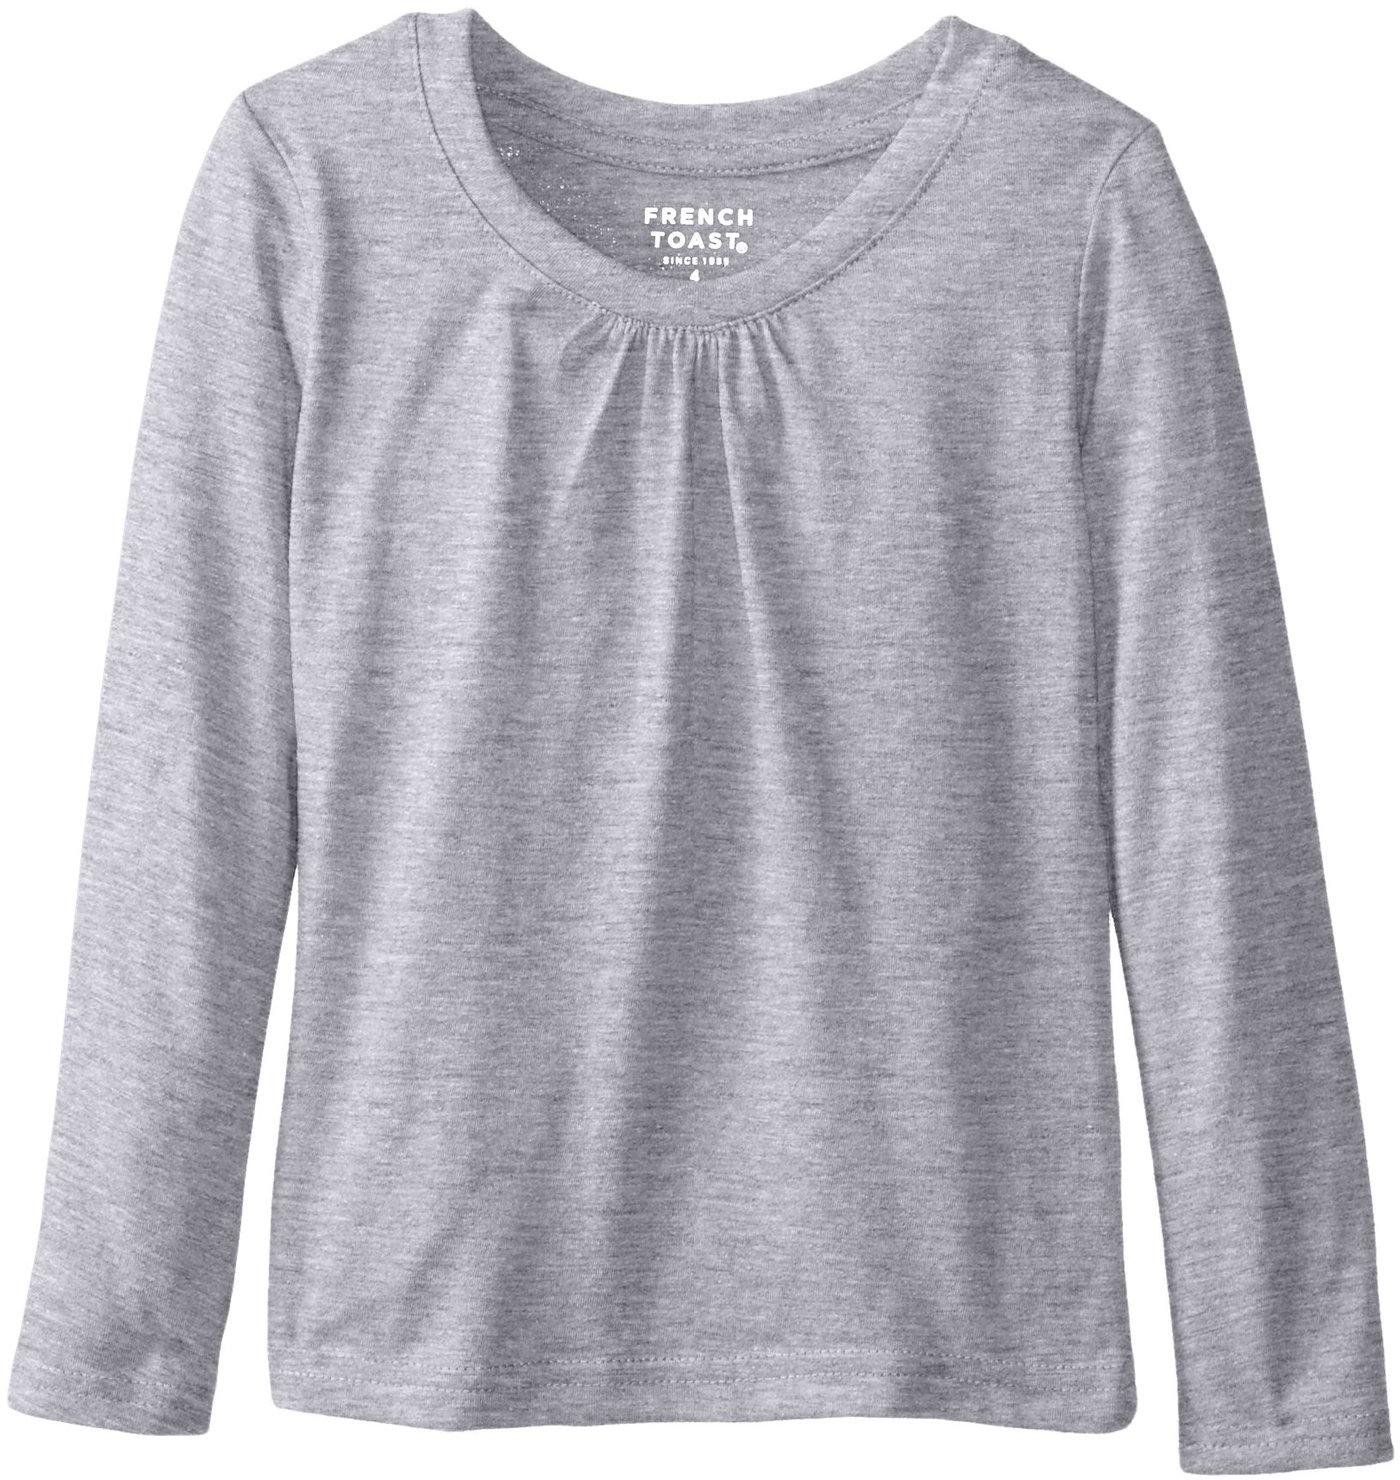 682e1e53fc3 French Toast School Uniform Girls Long Sleeve Crew Neck T-Shirt with ...